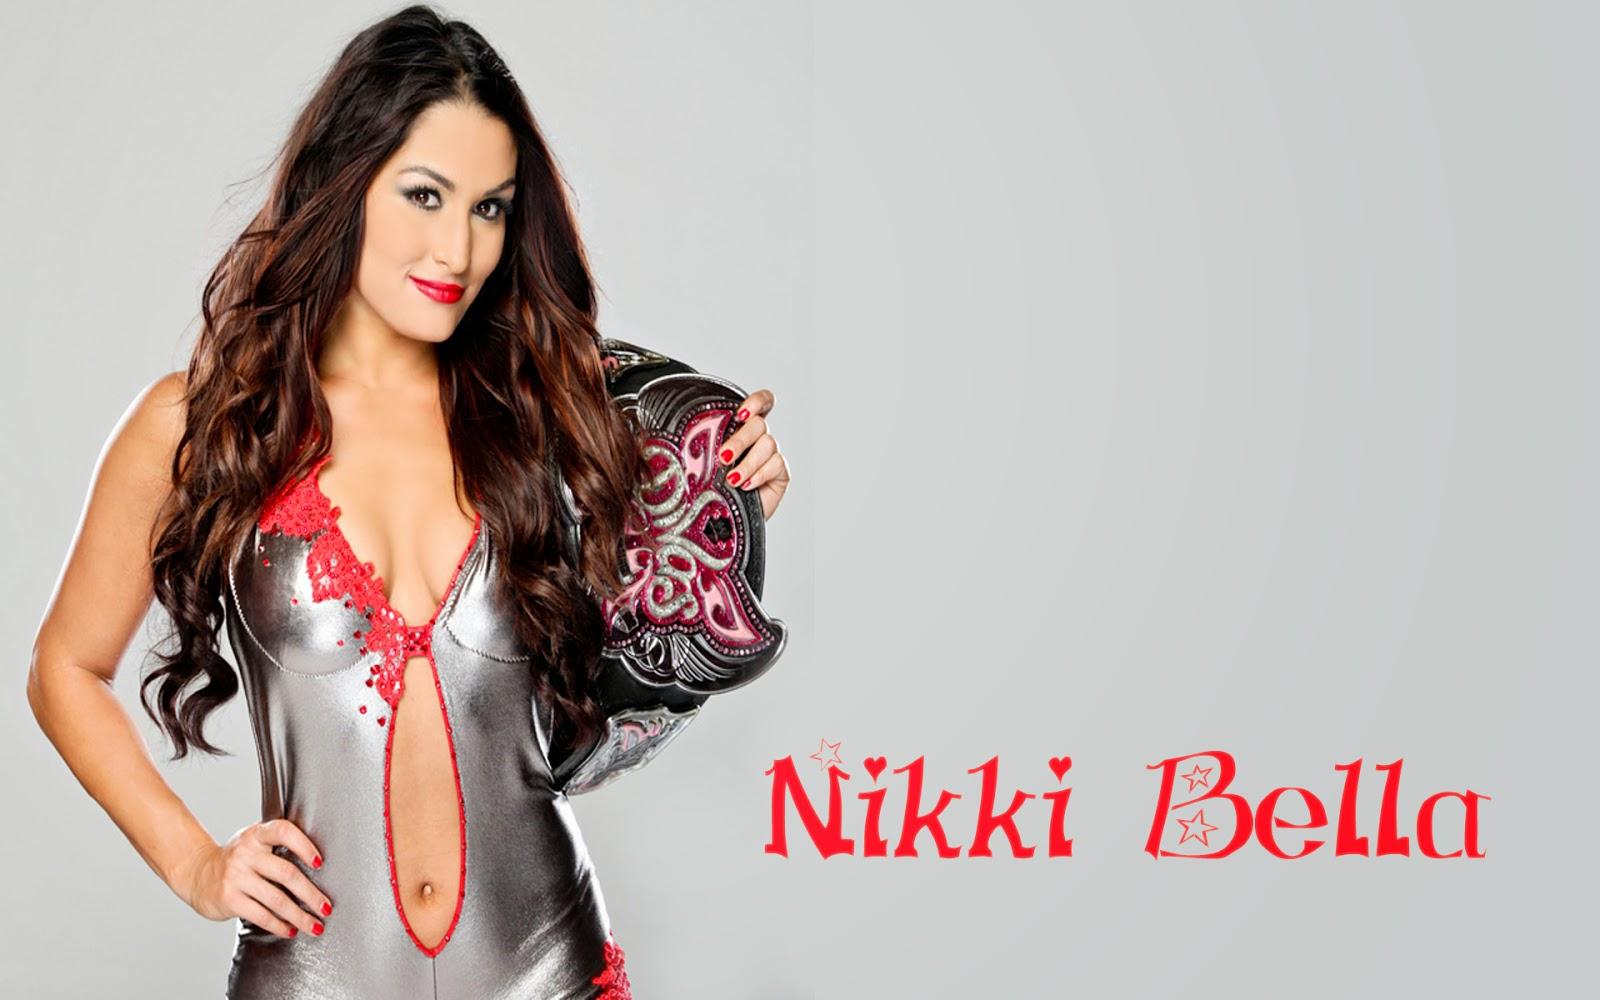 Sexy Images Of Nikki Bella